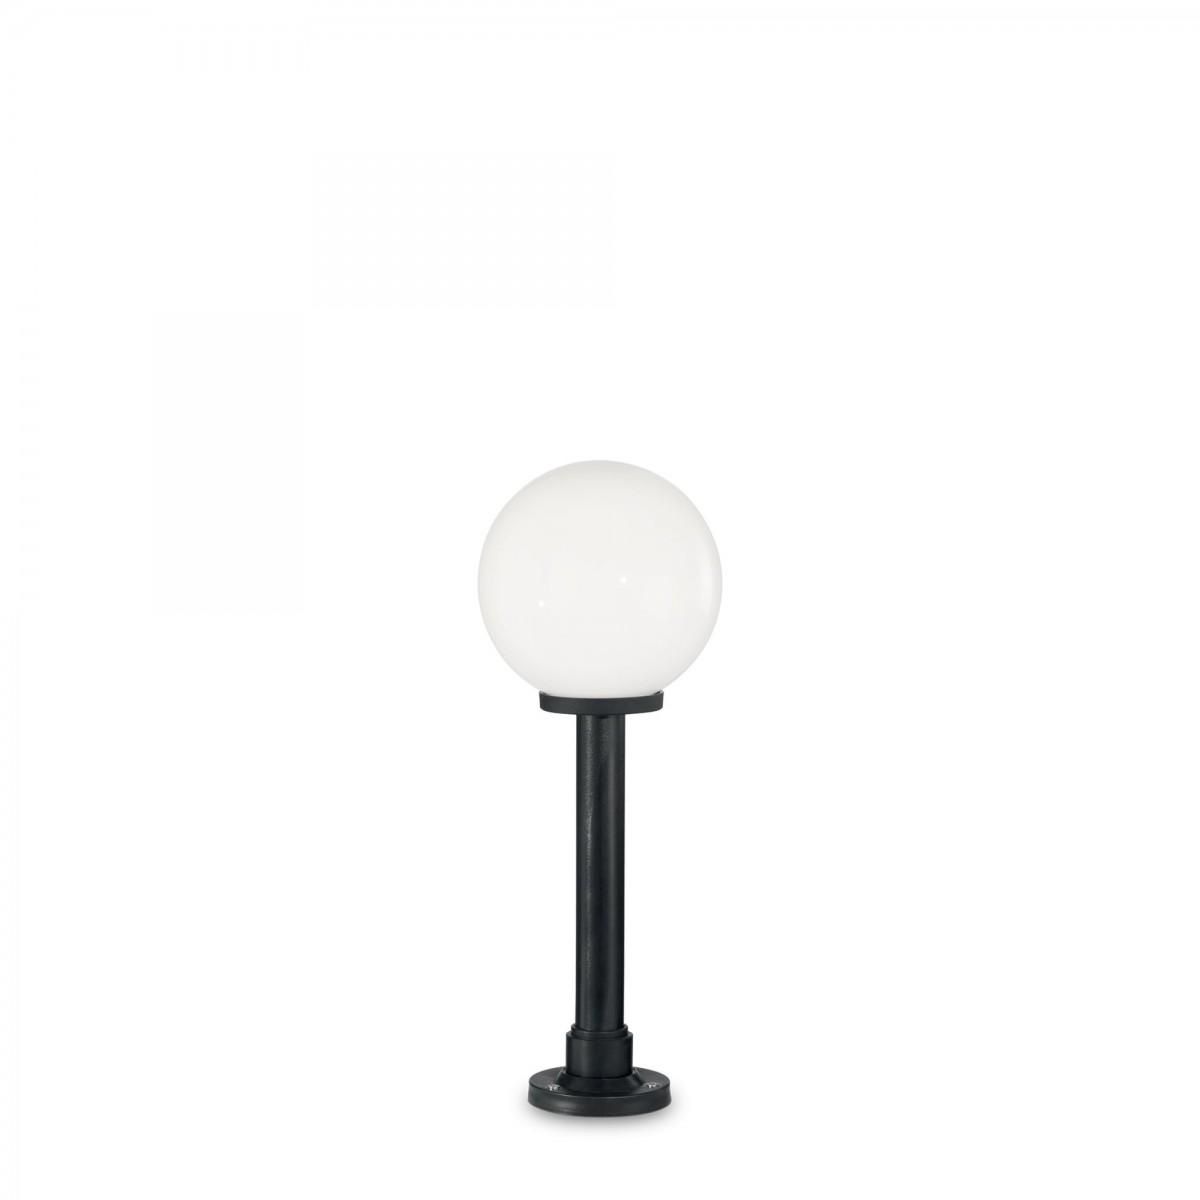 Ideal Lux 187549 venkovní lampa Classic Globe 1x23W|E27